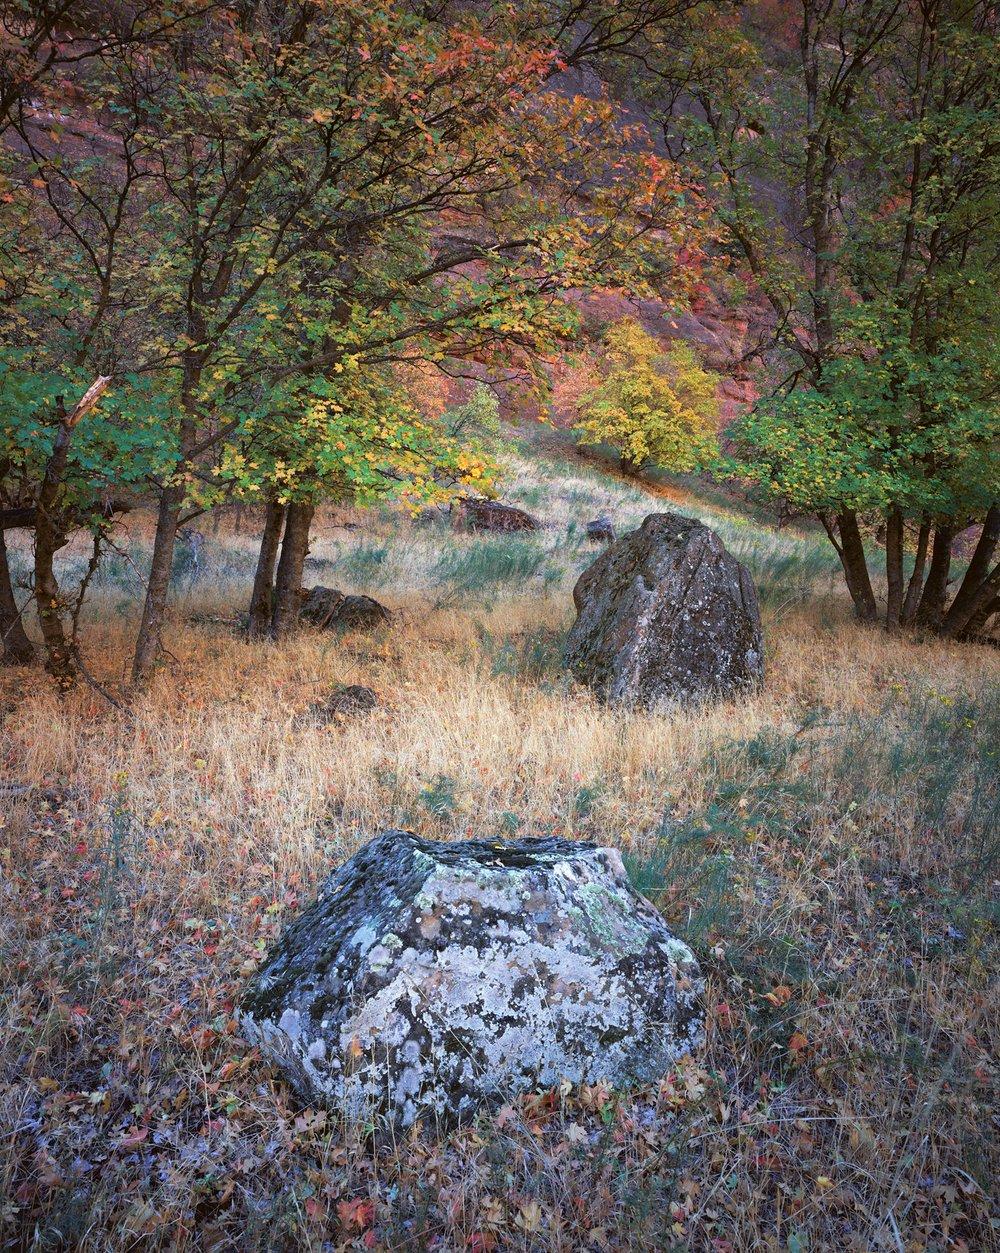 Enlightened Path  | Zion National Park, Utah